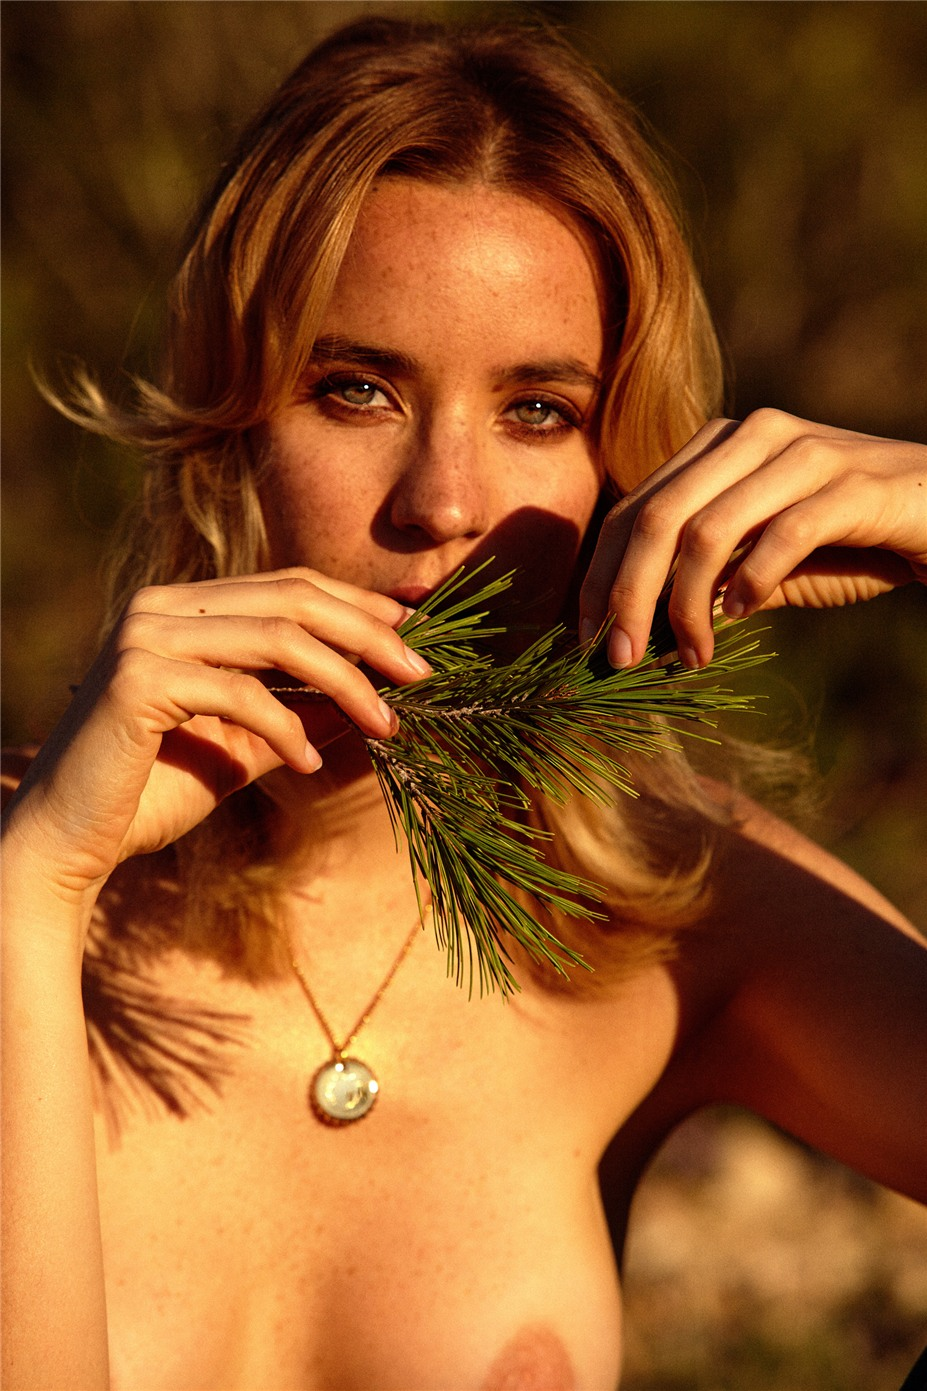 Обнаженные девушки на пляжах Ибицы / Ibiza Nudes by Diane Betties - Nuria Freckles